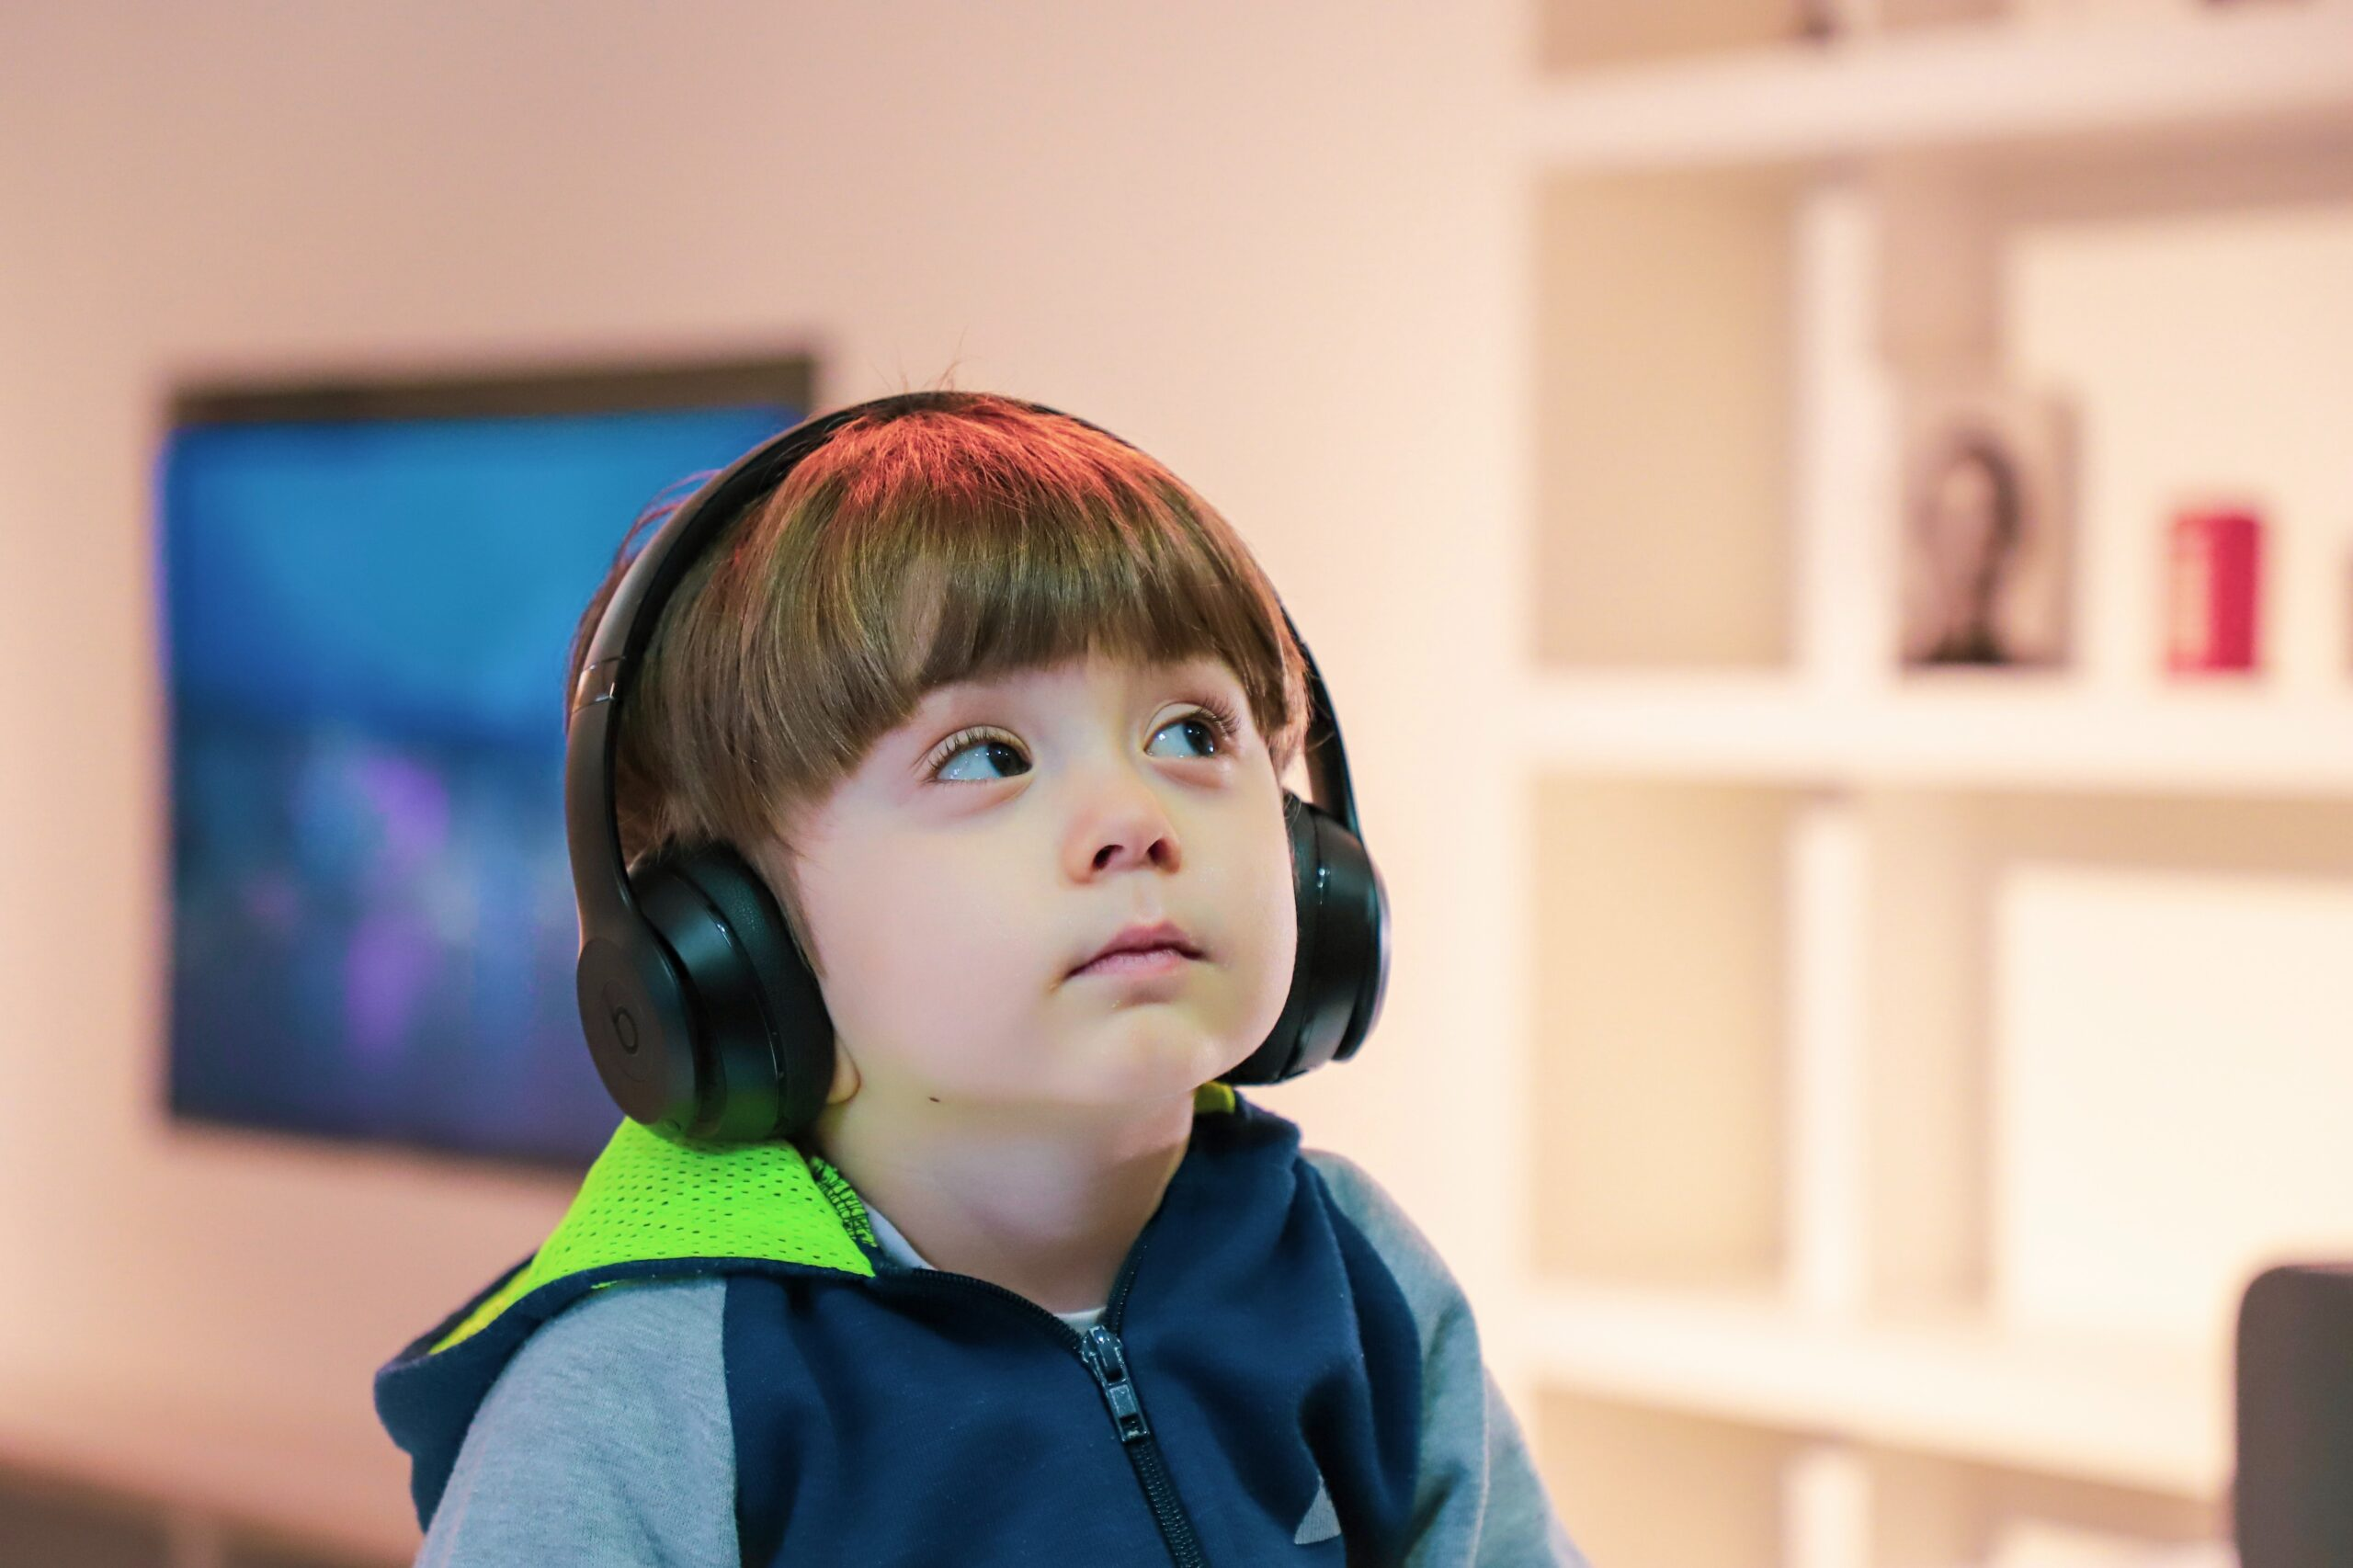 boy with earphones